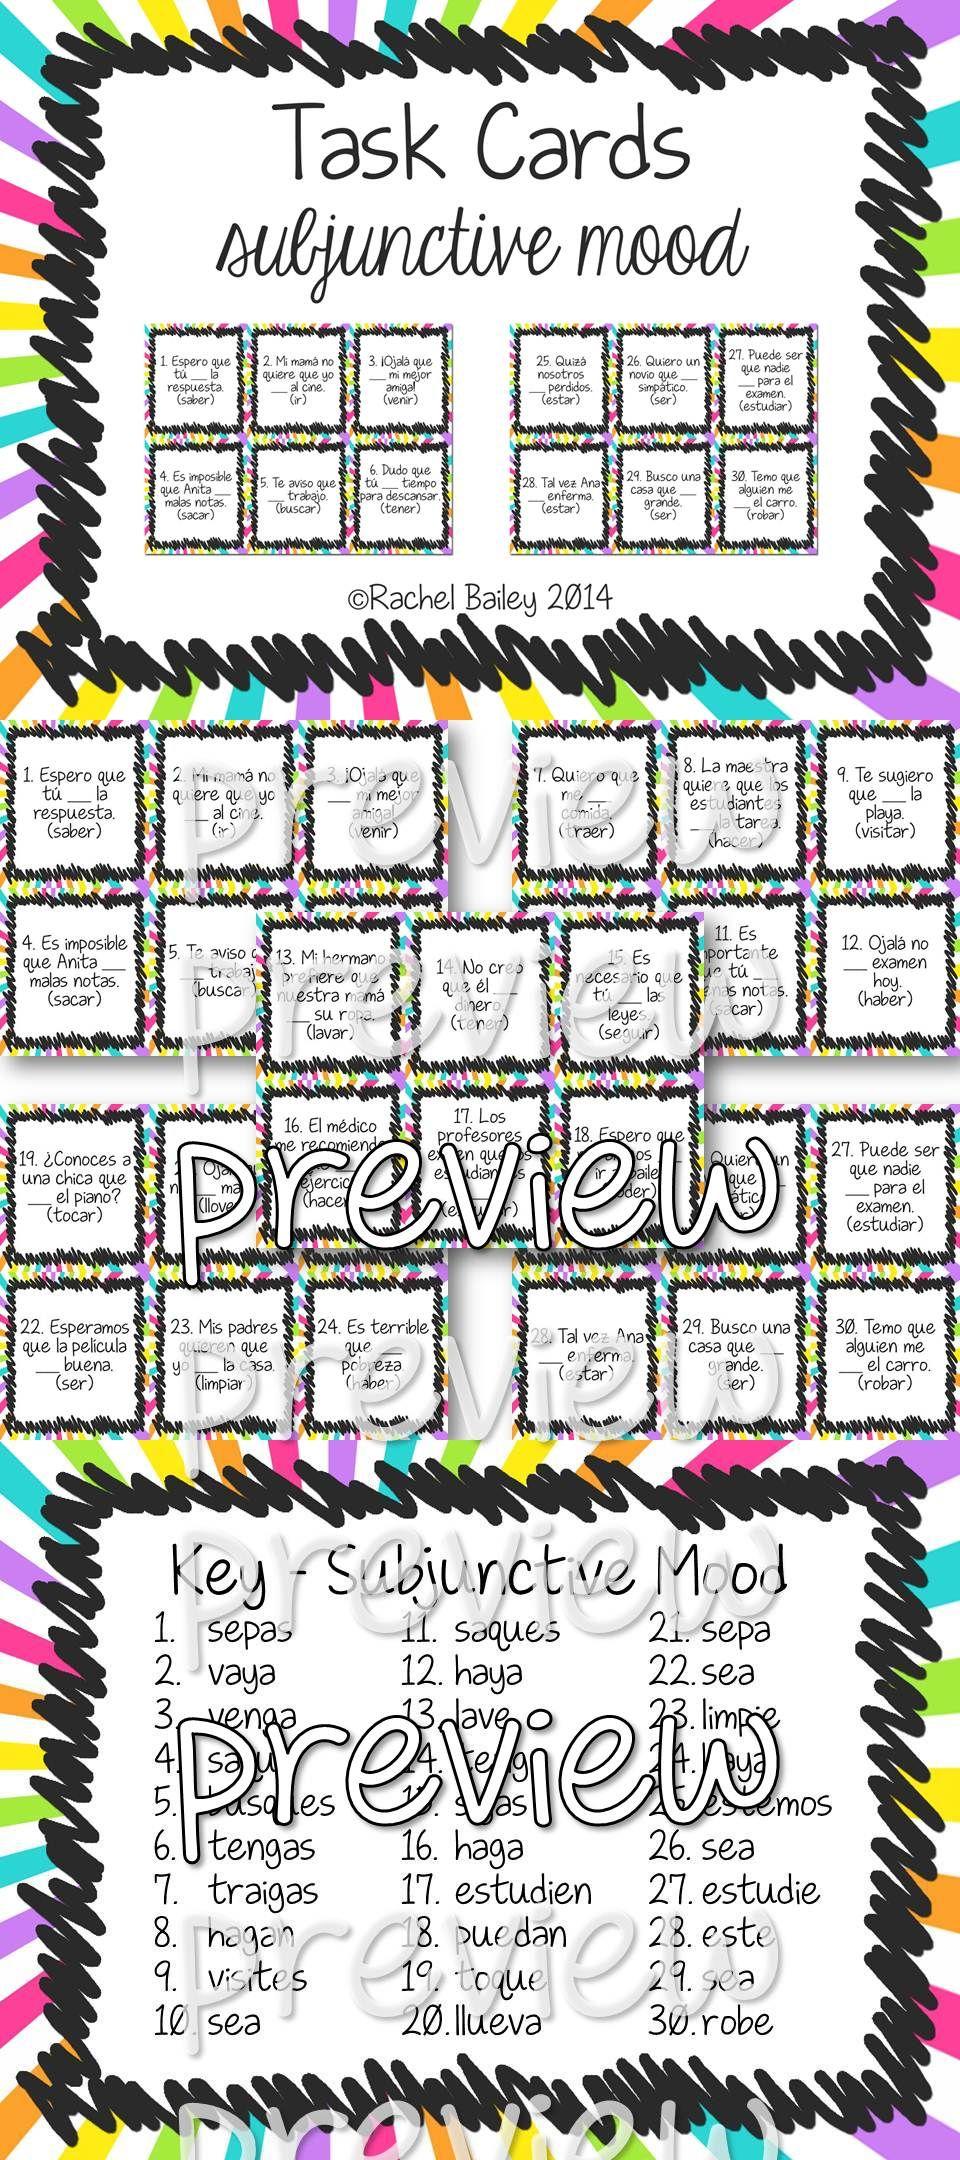 Pin By Senorita Creativa On Tpt Previews Task Cards Teaching Spanish Learning Spanish [ 2160 x 960 Pixel ]